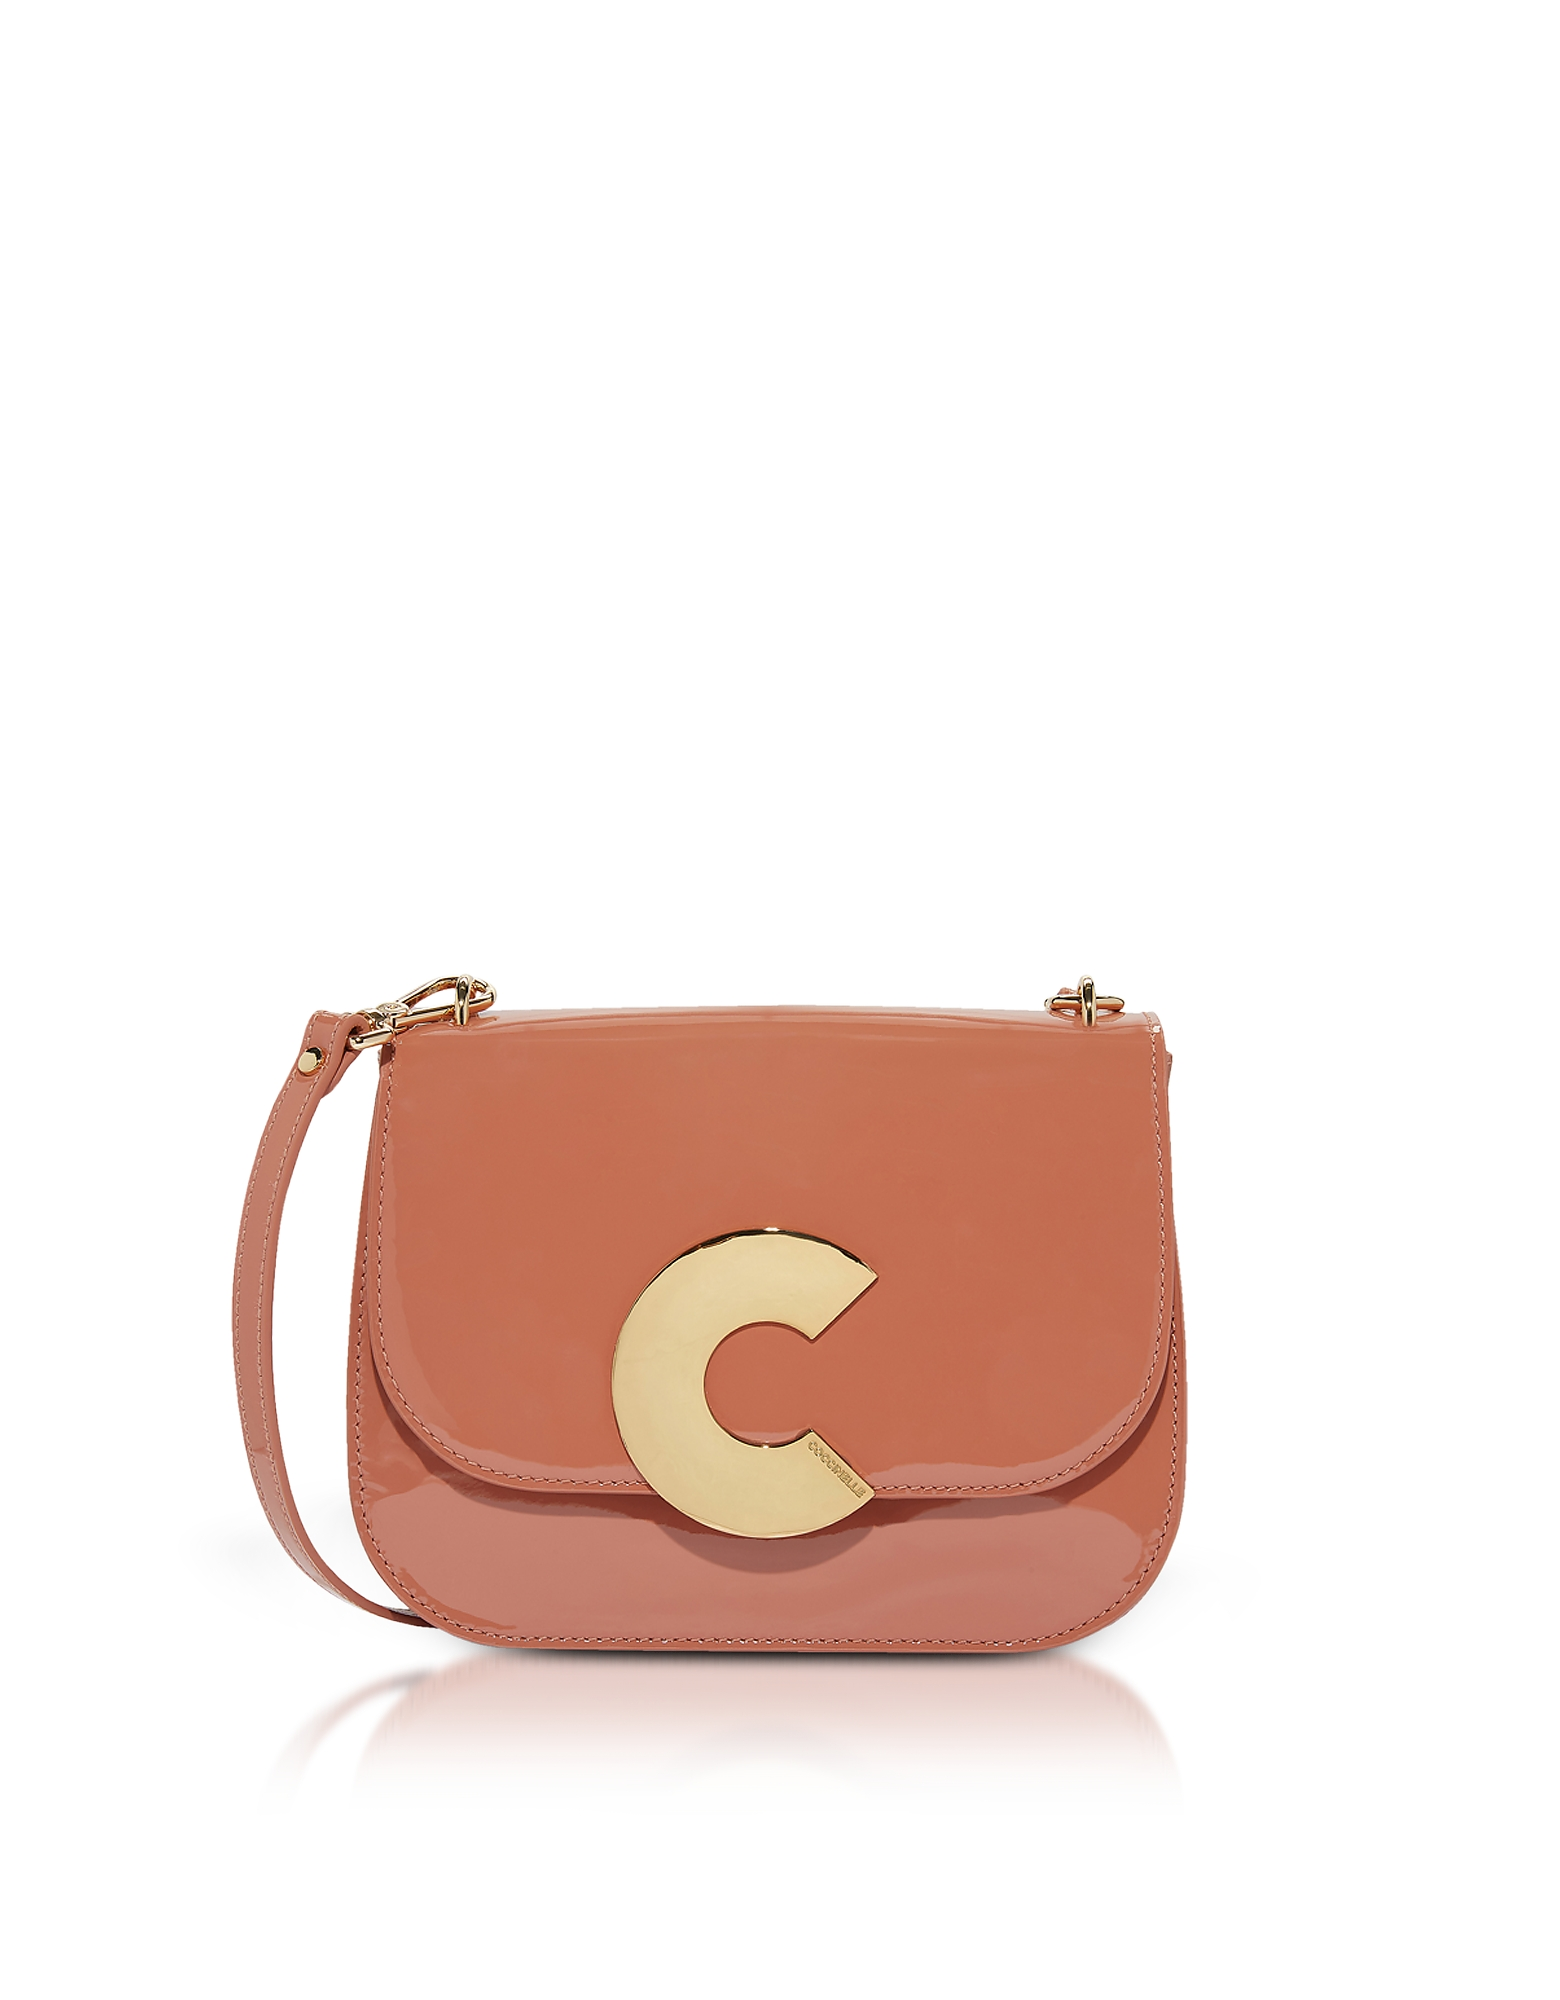 Image of Coccinelle Designer Handbags, Craquante Rock Medium Patent Leather Shoulder Bag